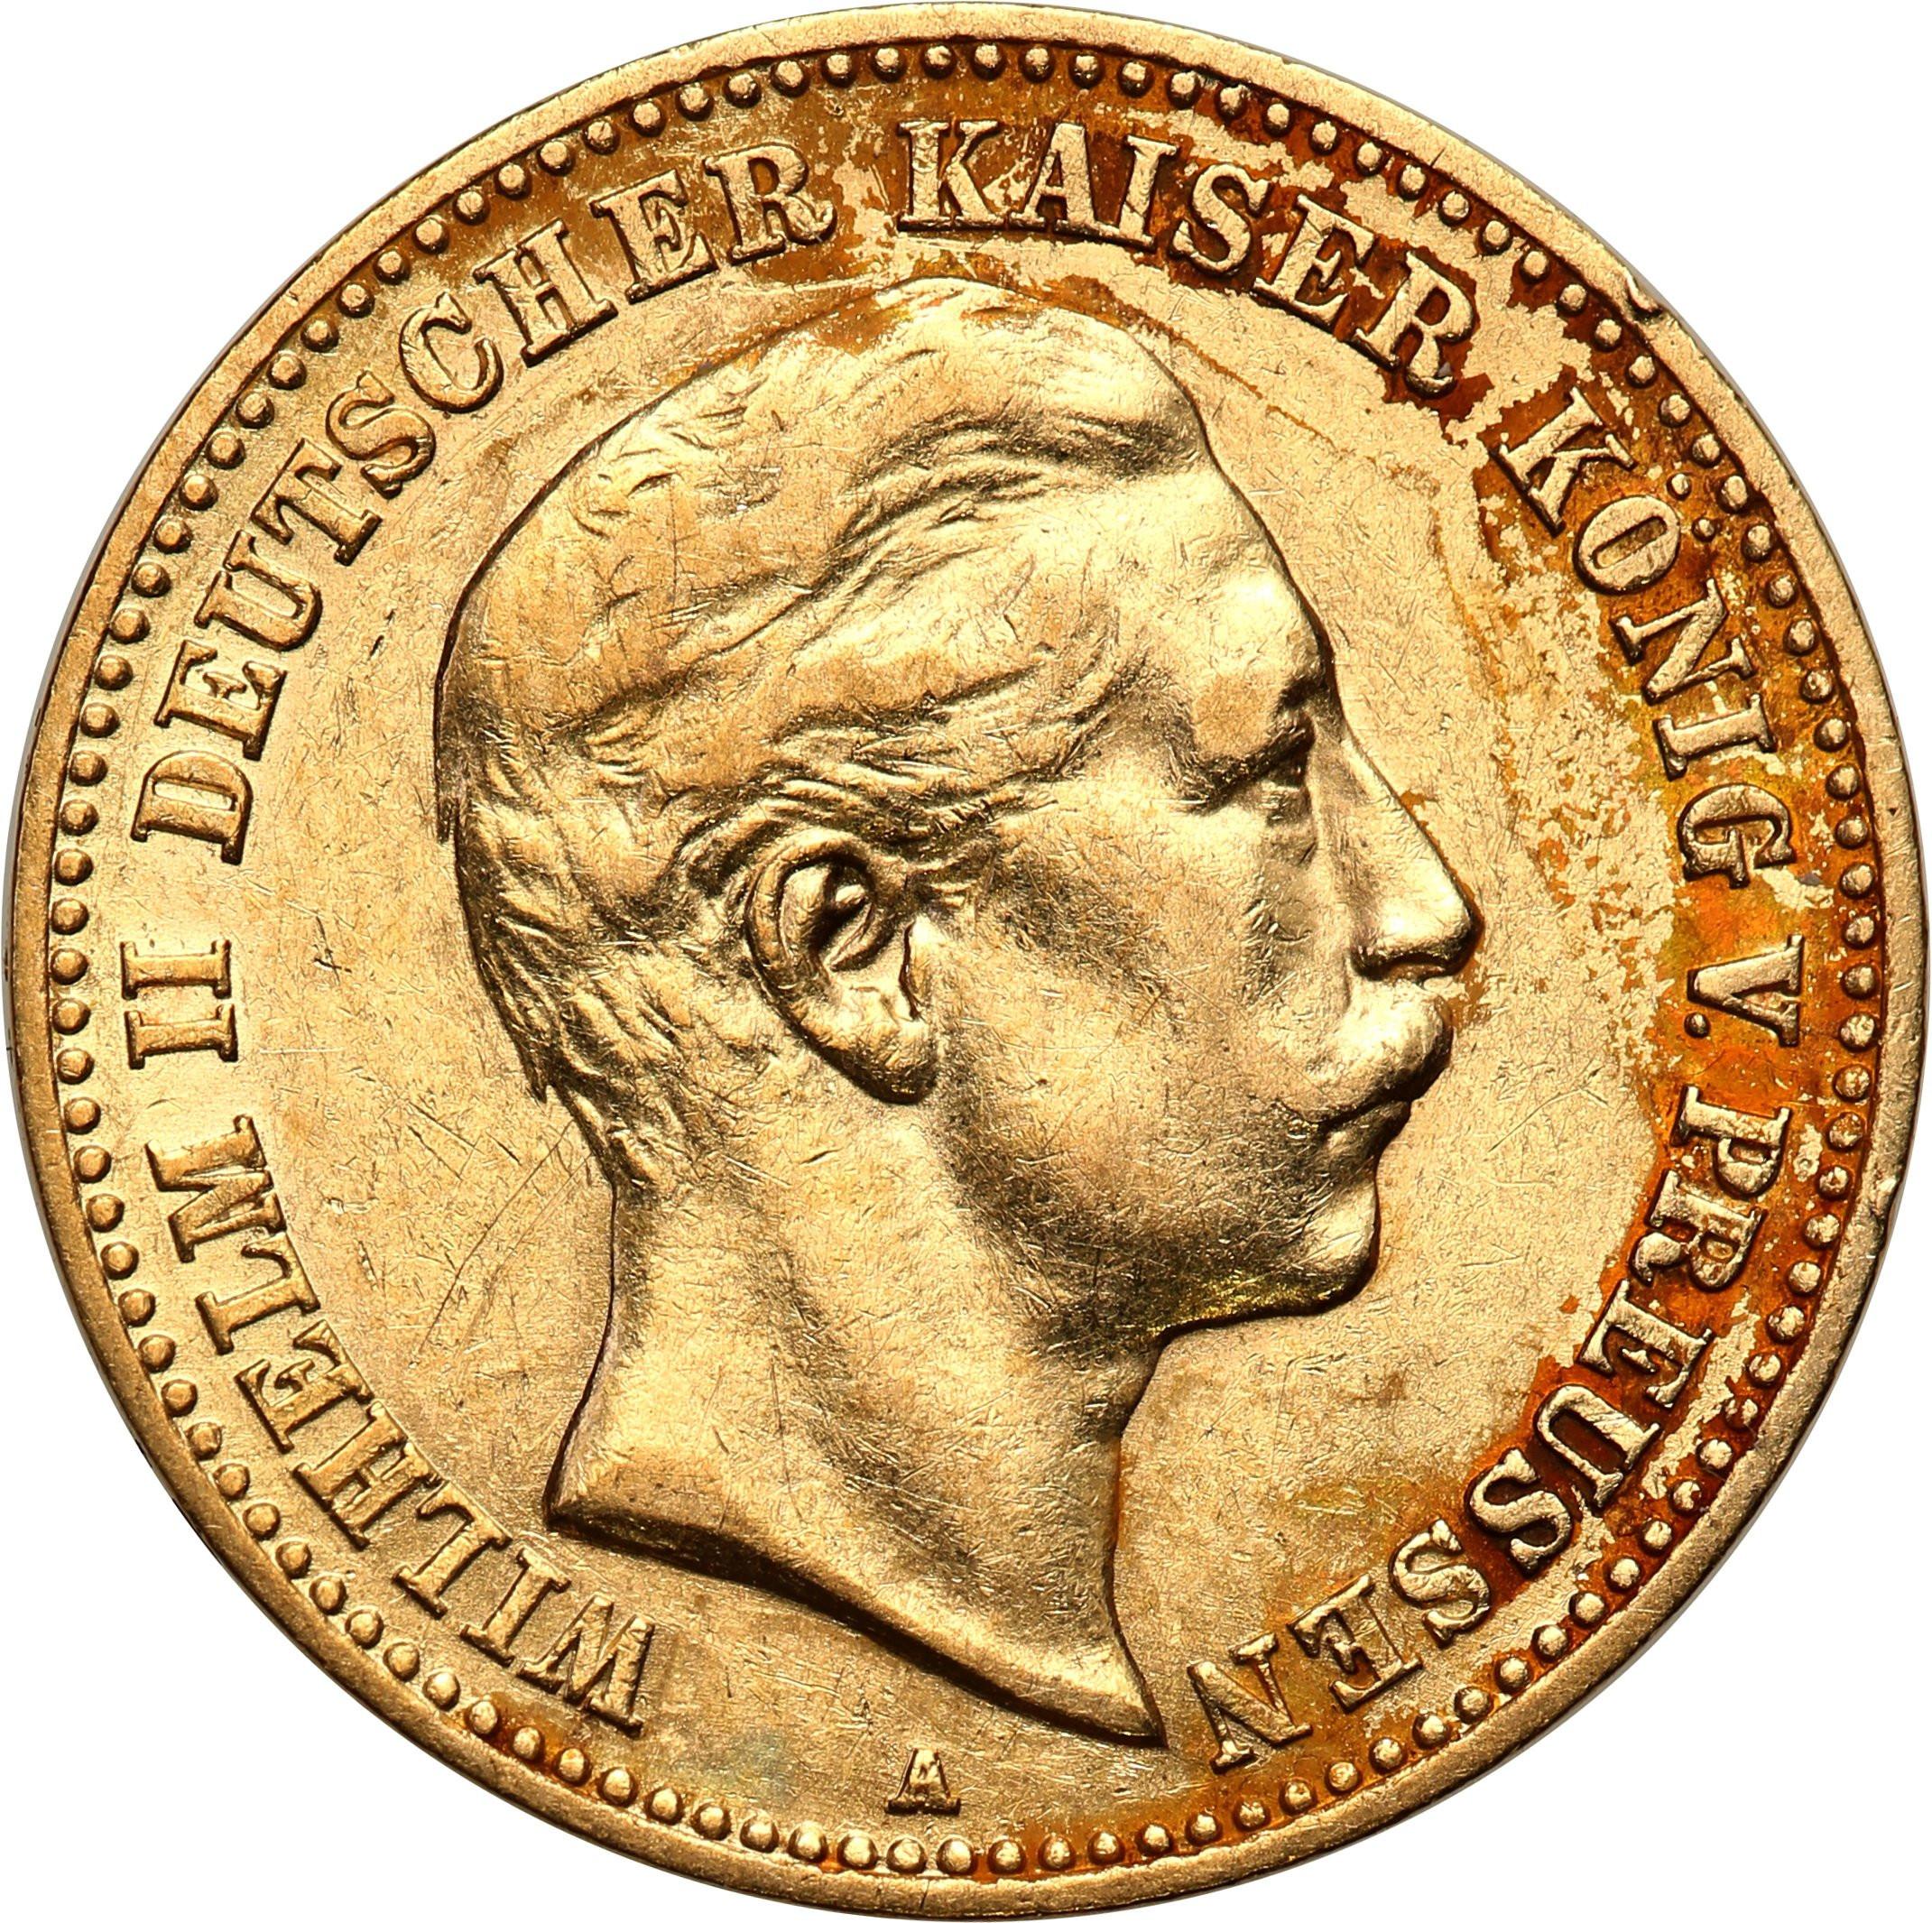 Niemcy Prusy 10 Marek 1902 A st.2-